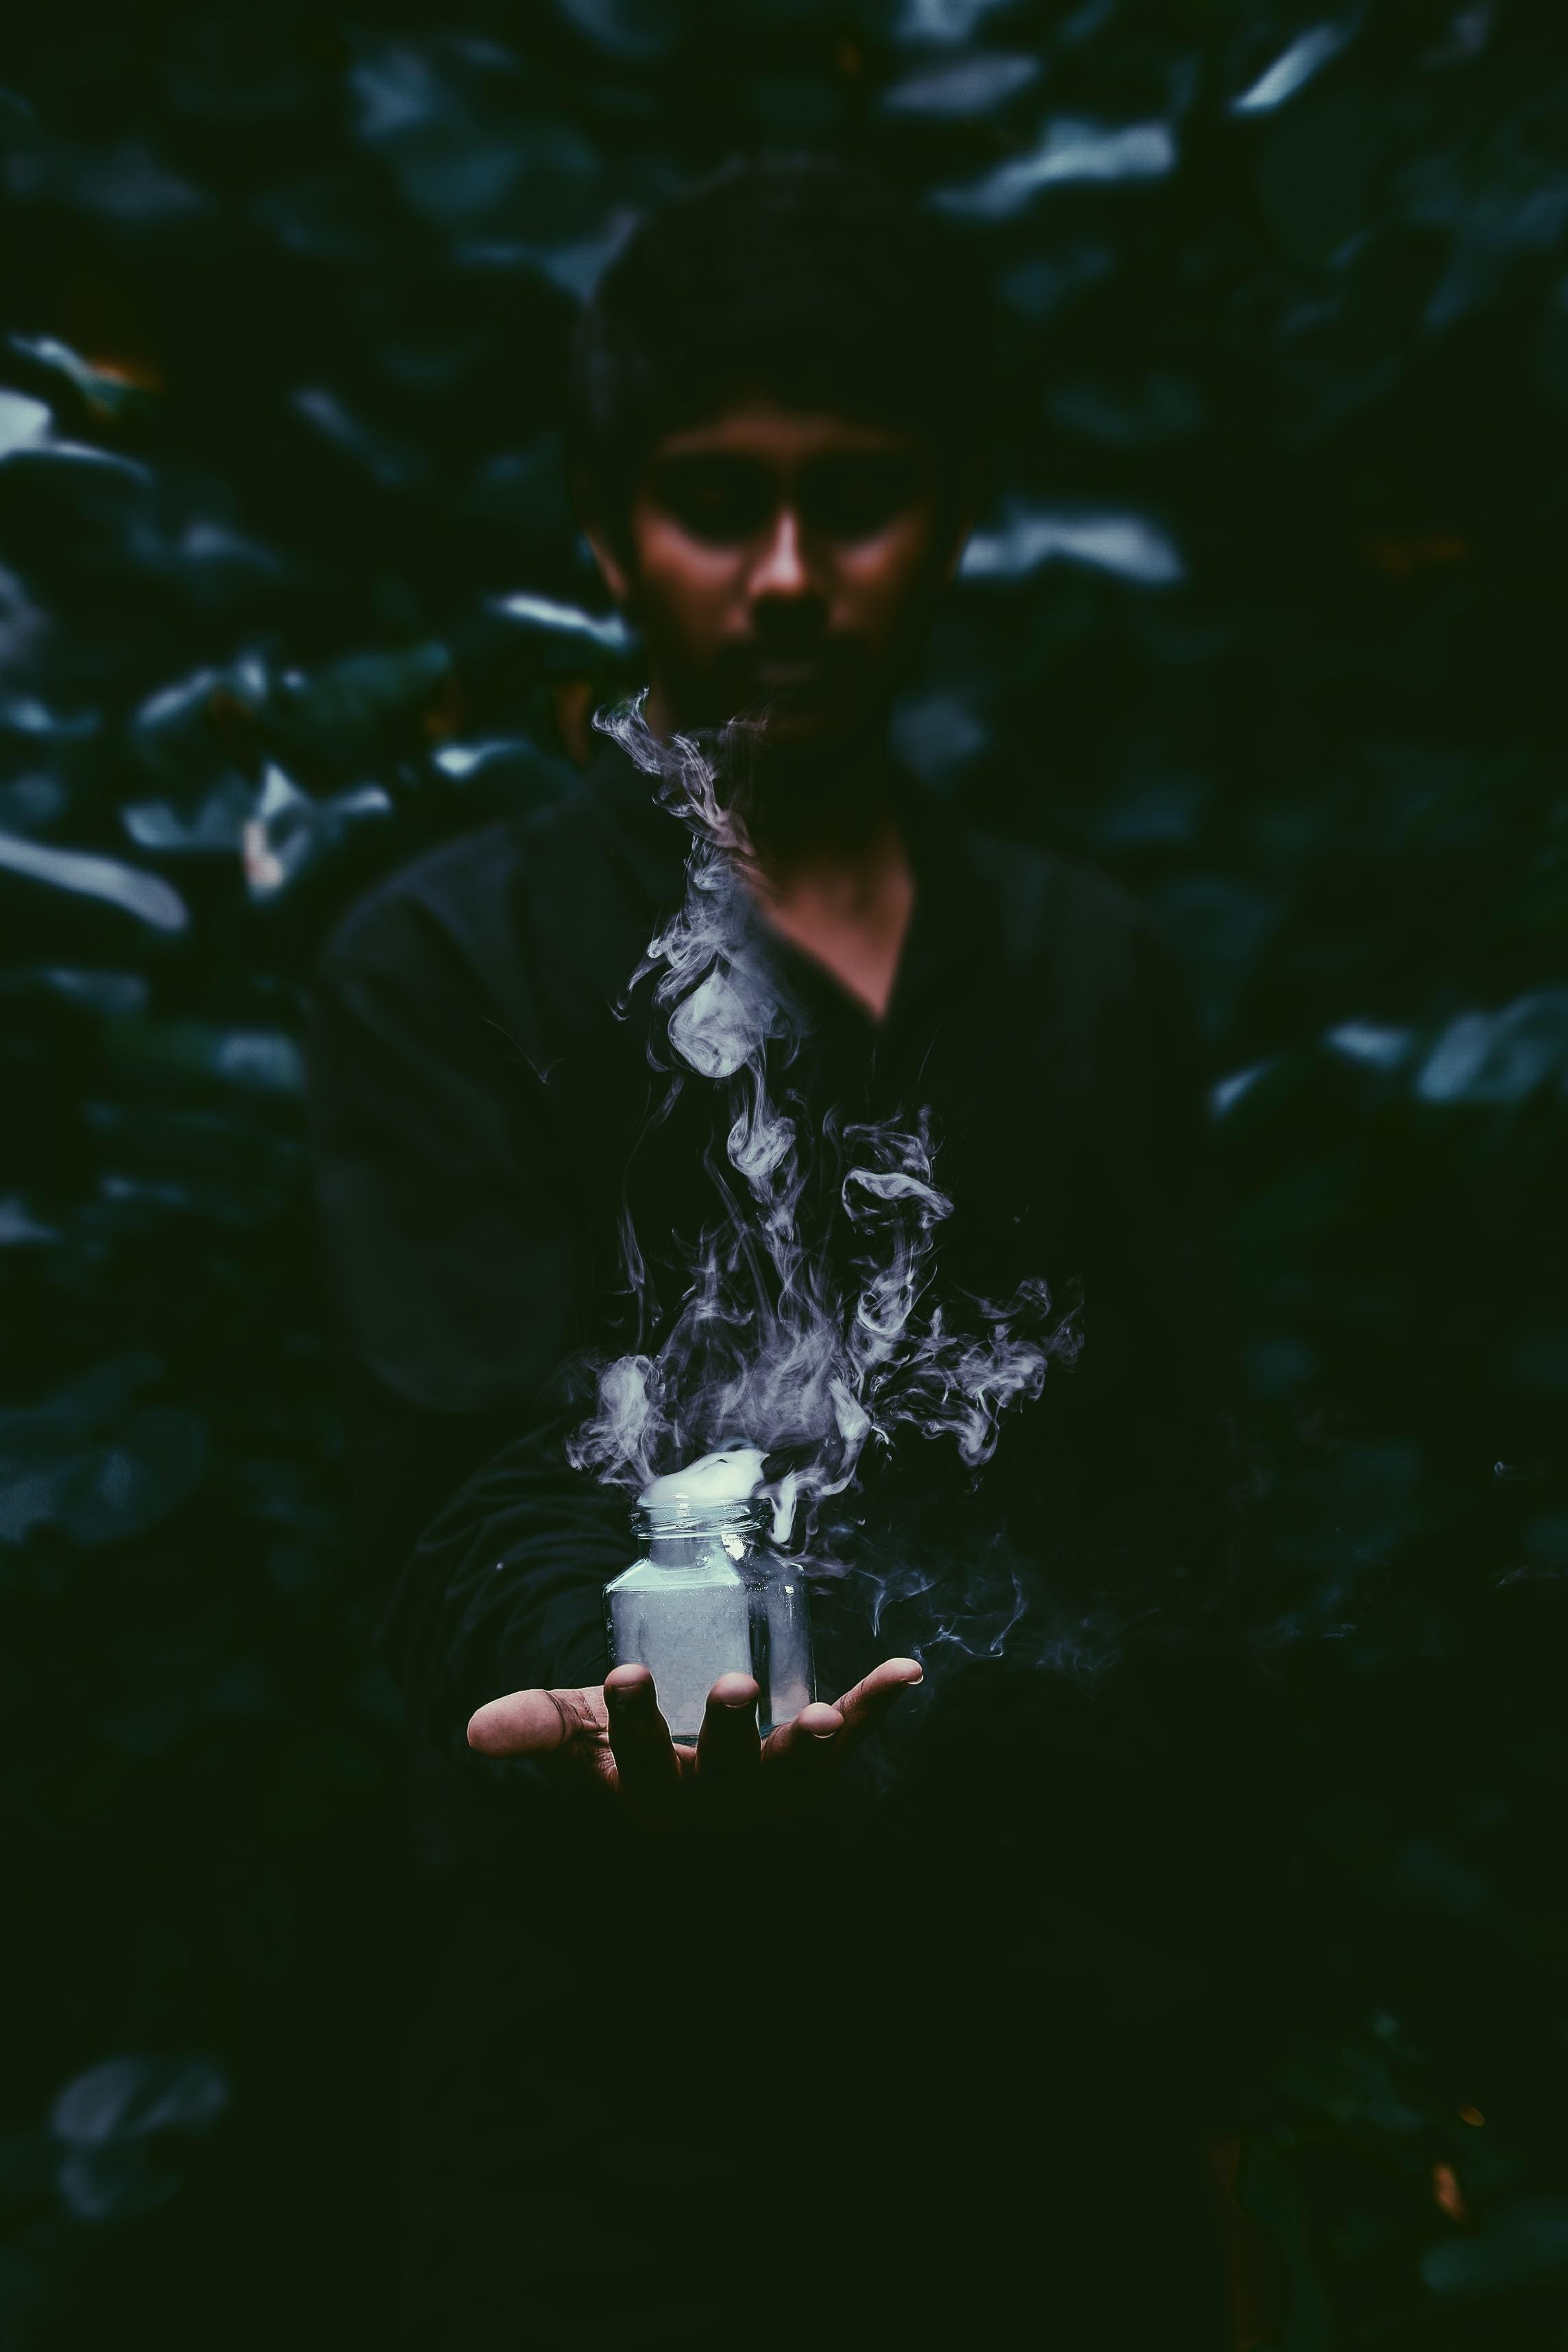 man holding jar with smoke